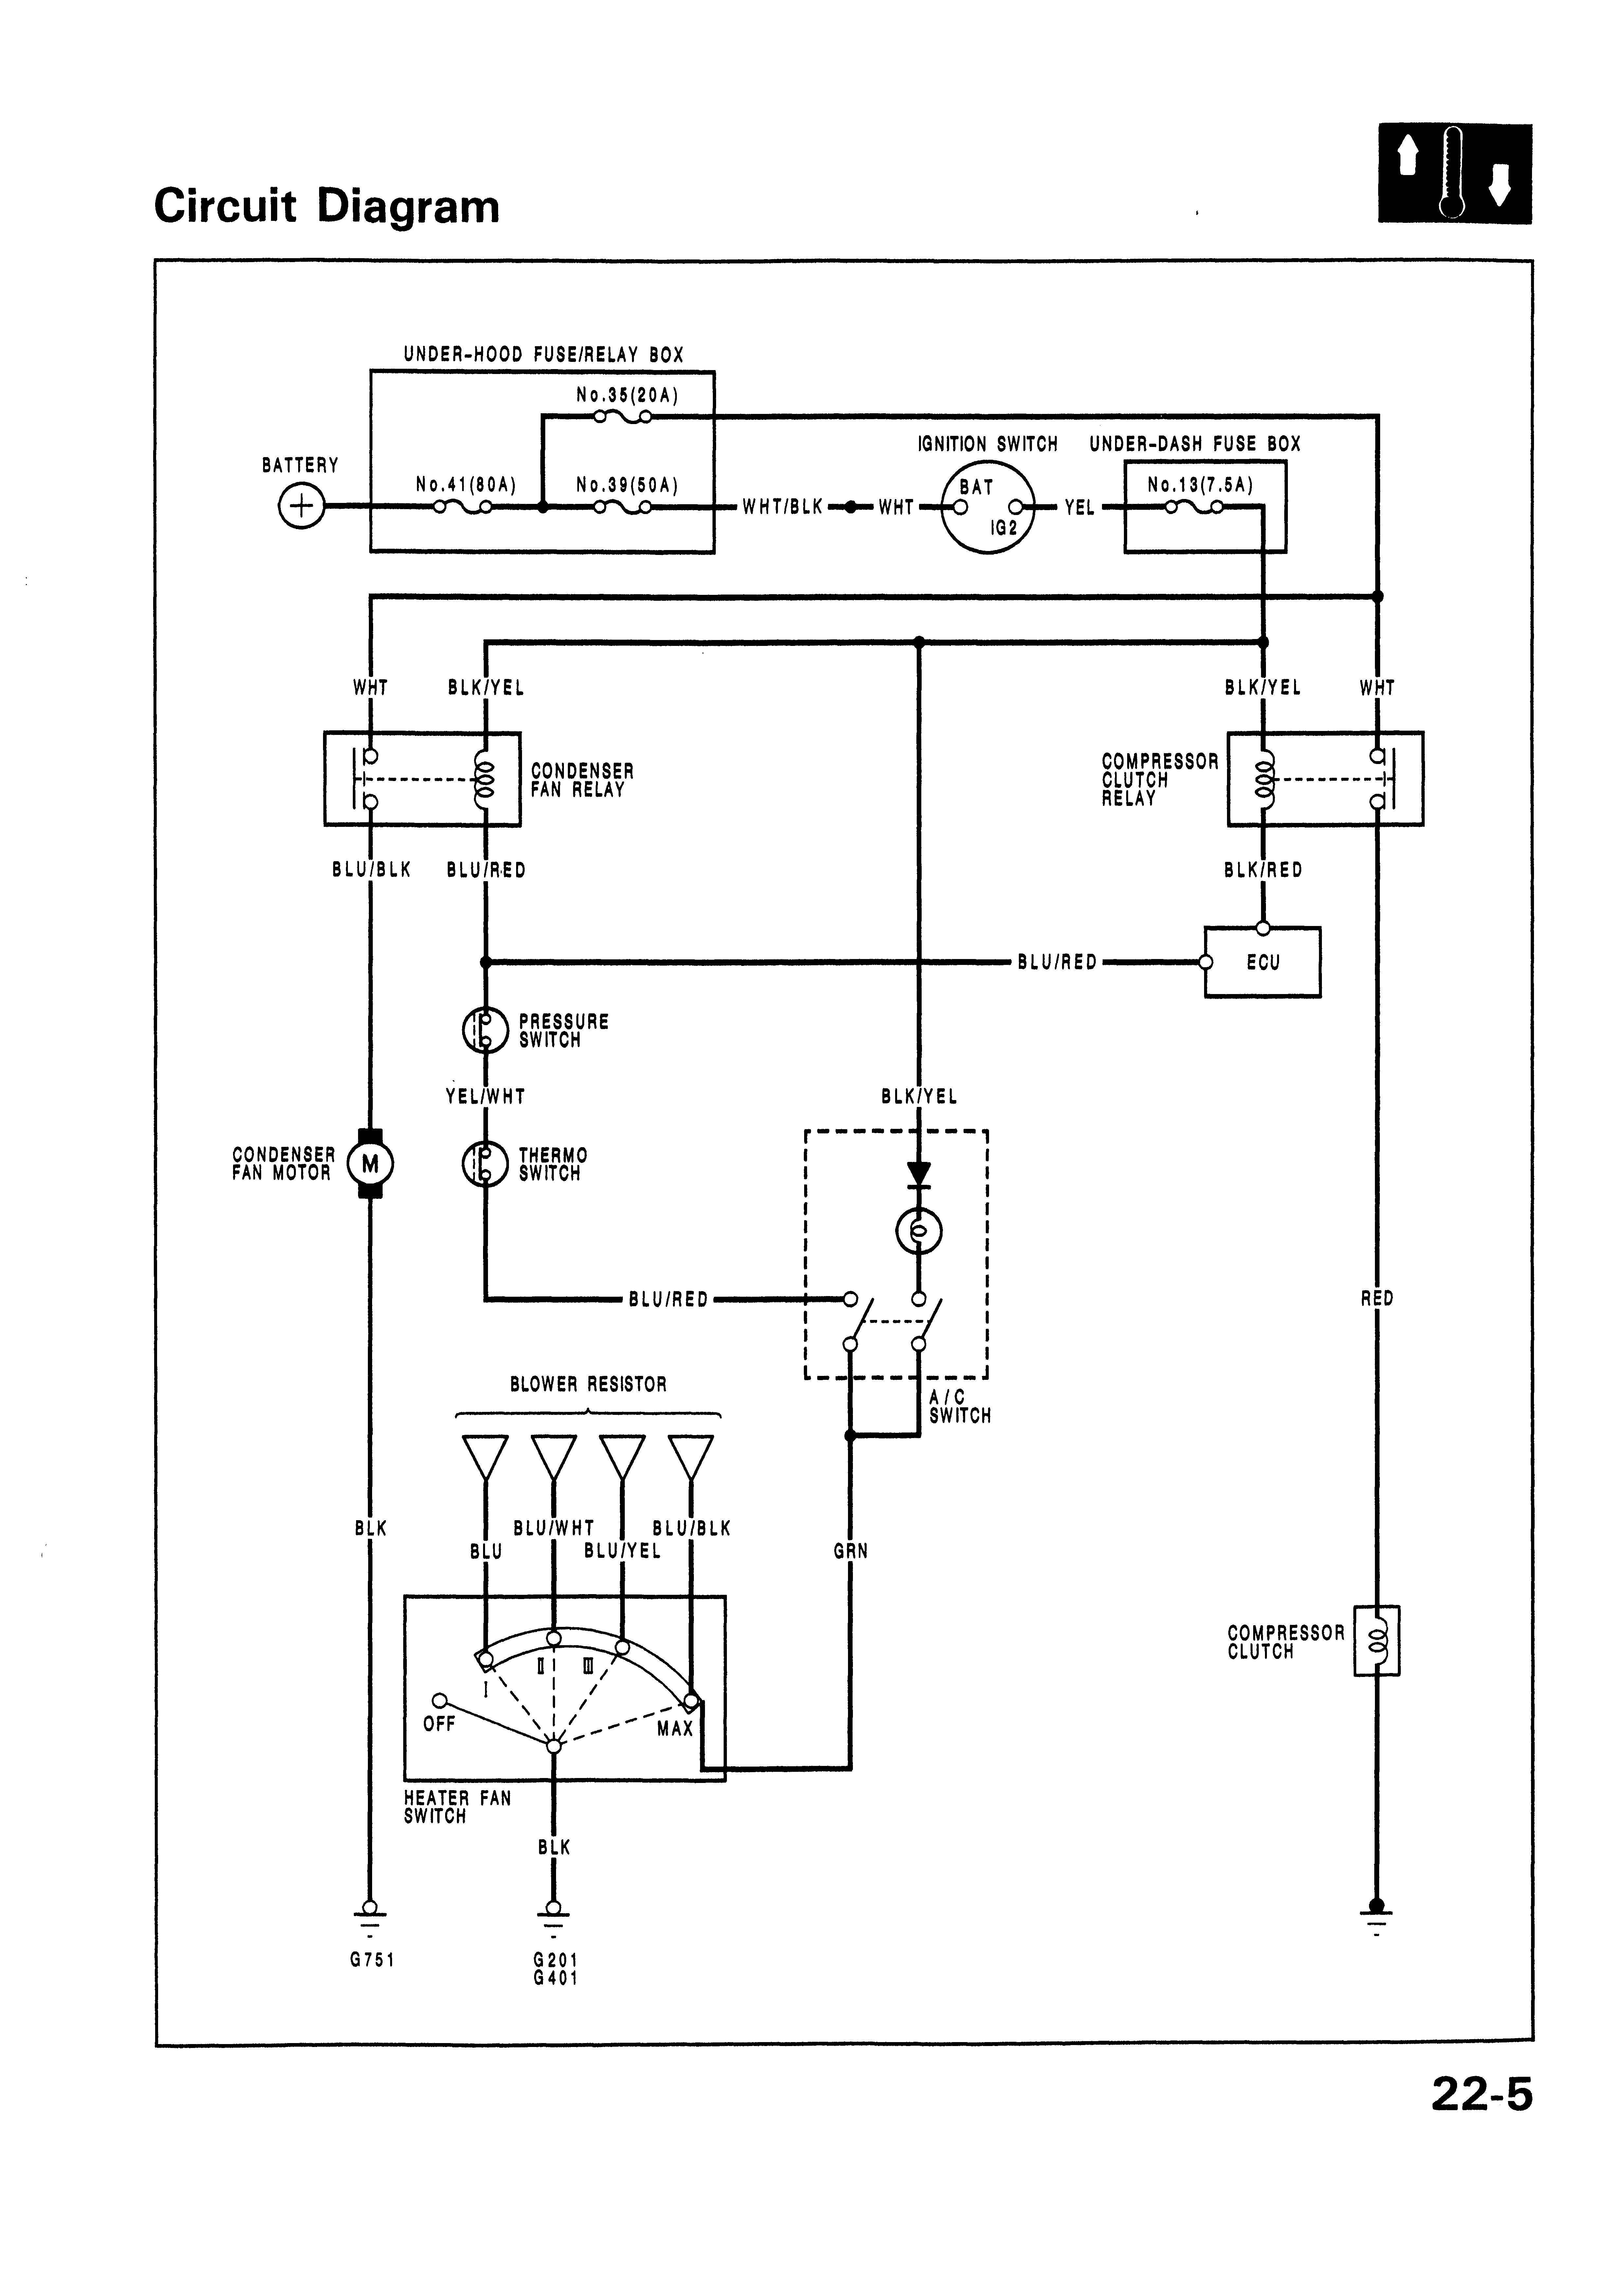 Wiring Diagram Car Air Conditioning Con Imagenes Ing